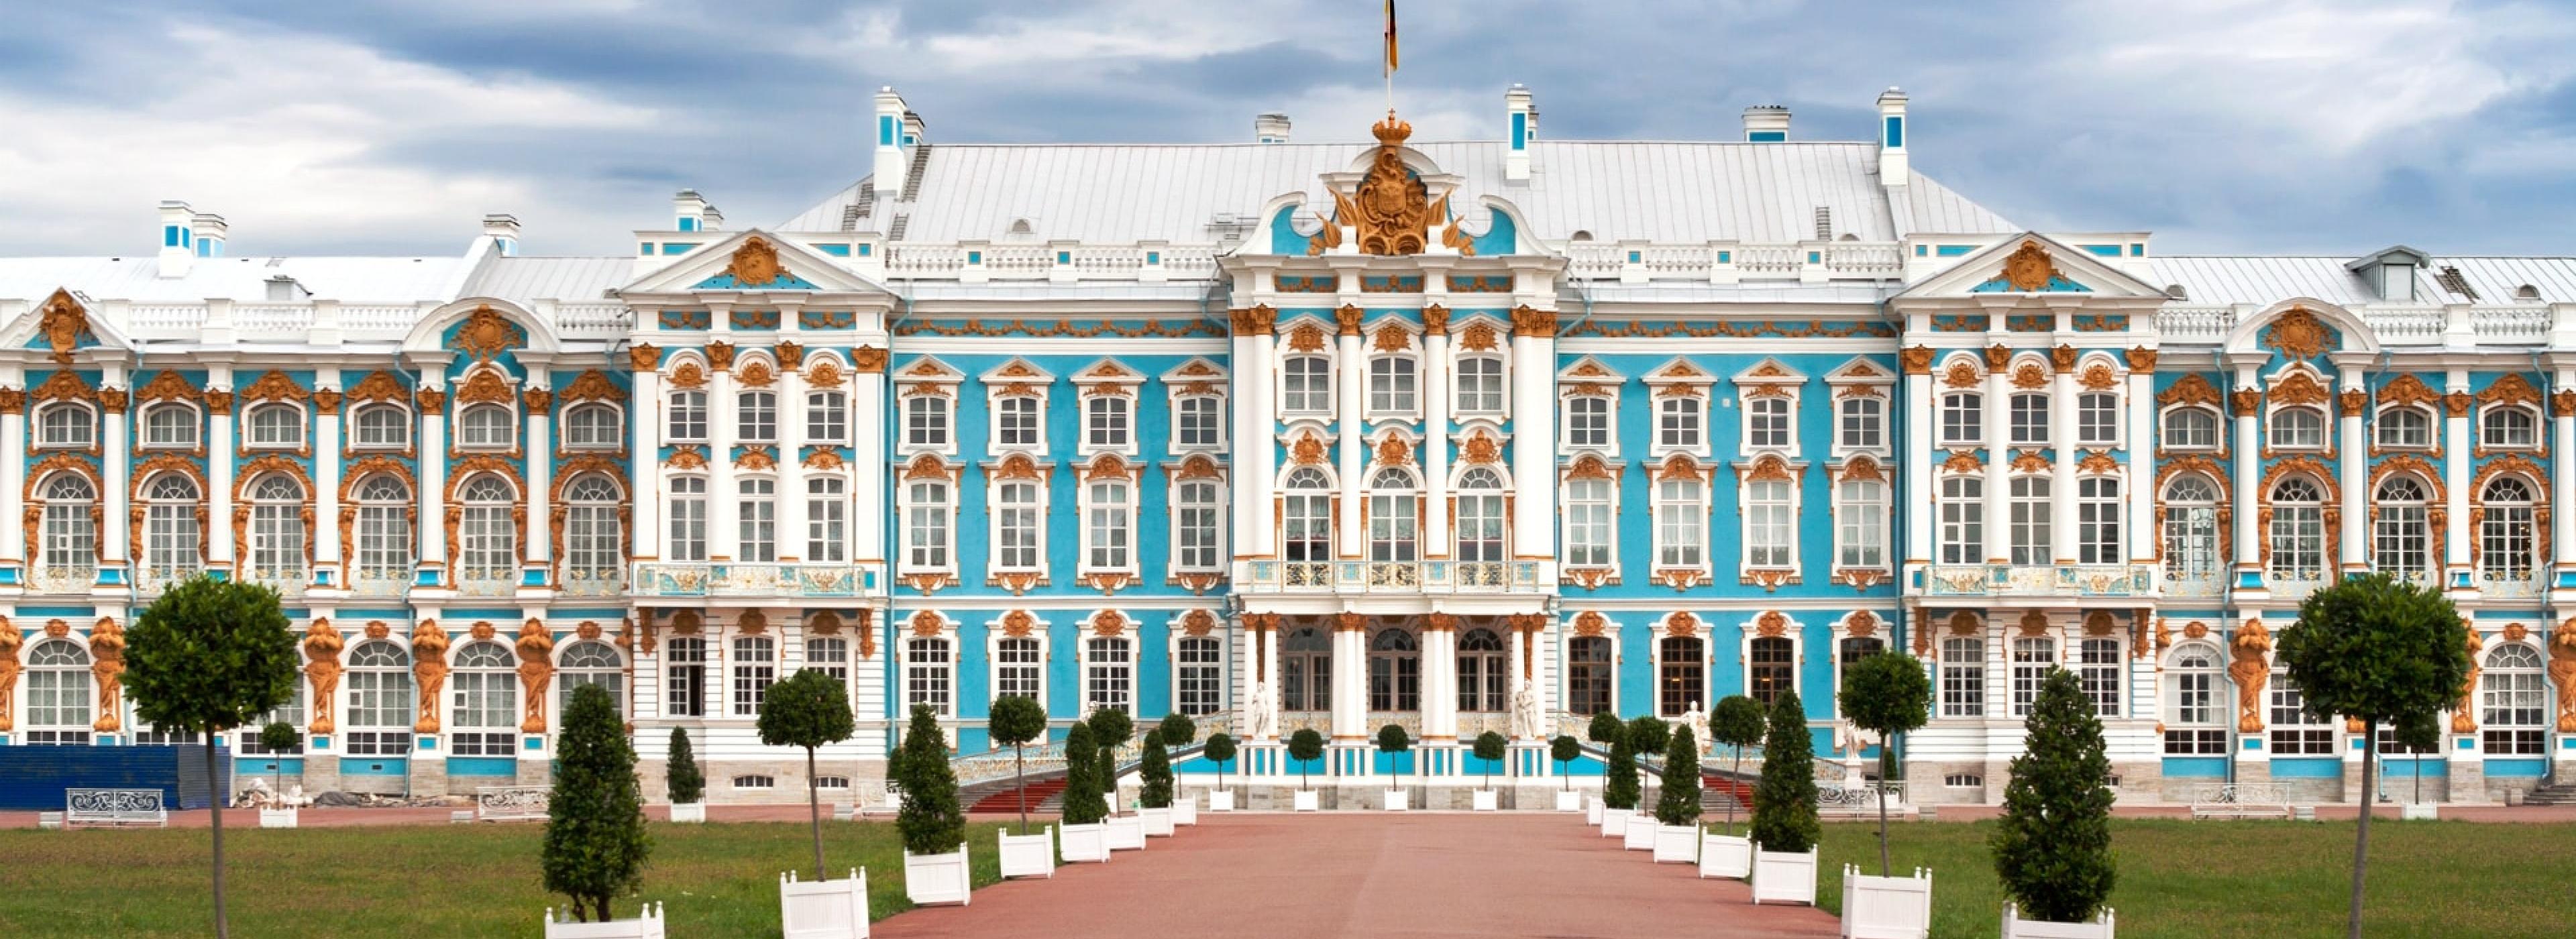 Pushkin, Russia